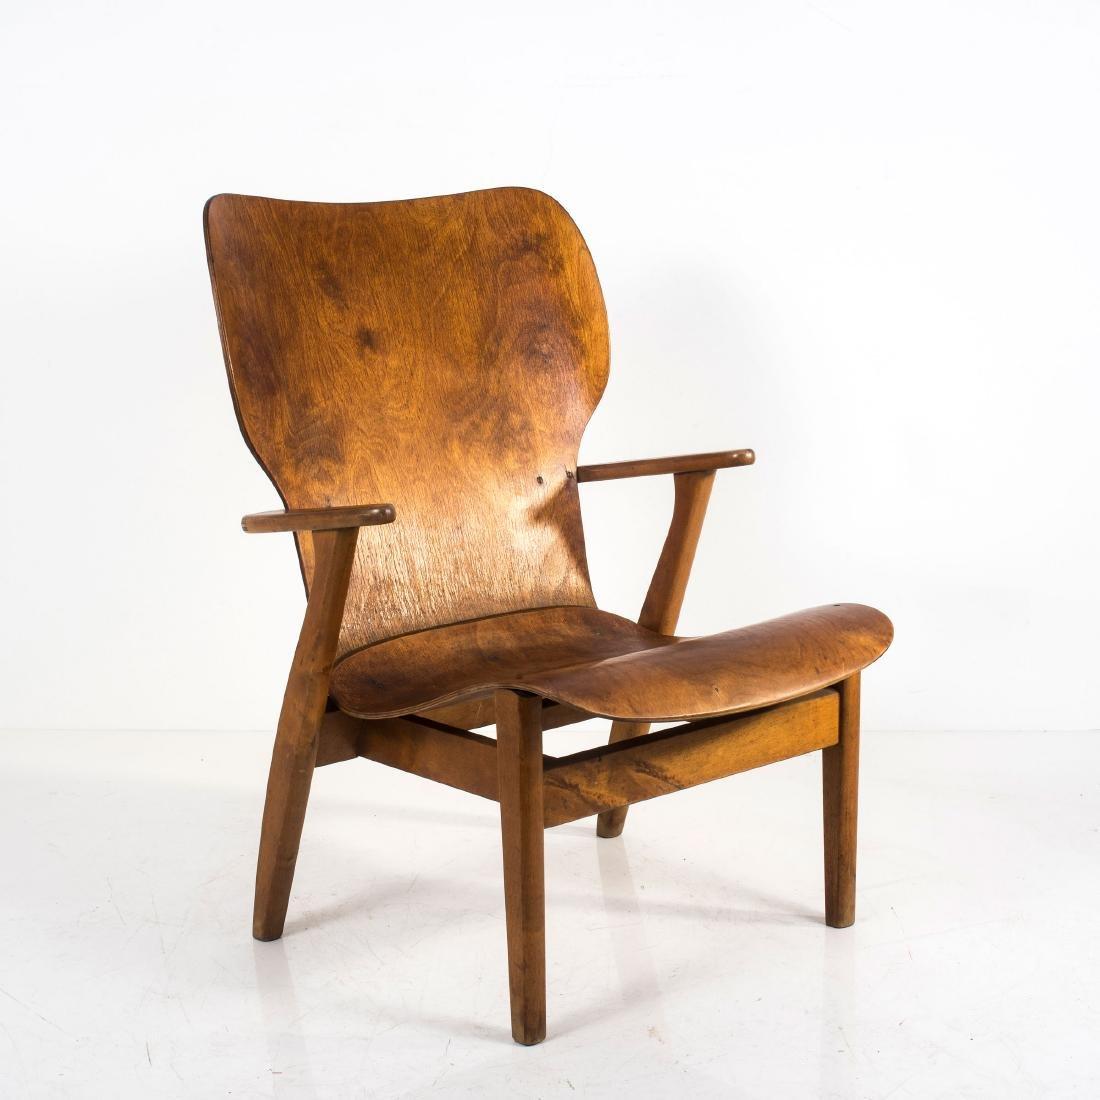 Armchair 'Domus Lux', c1948 - 5